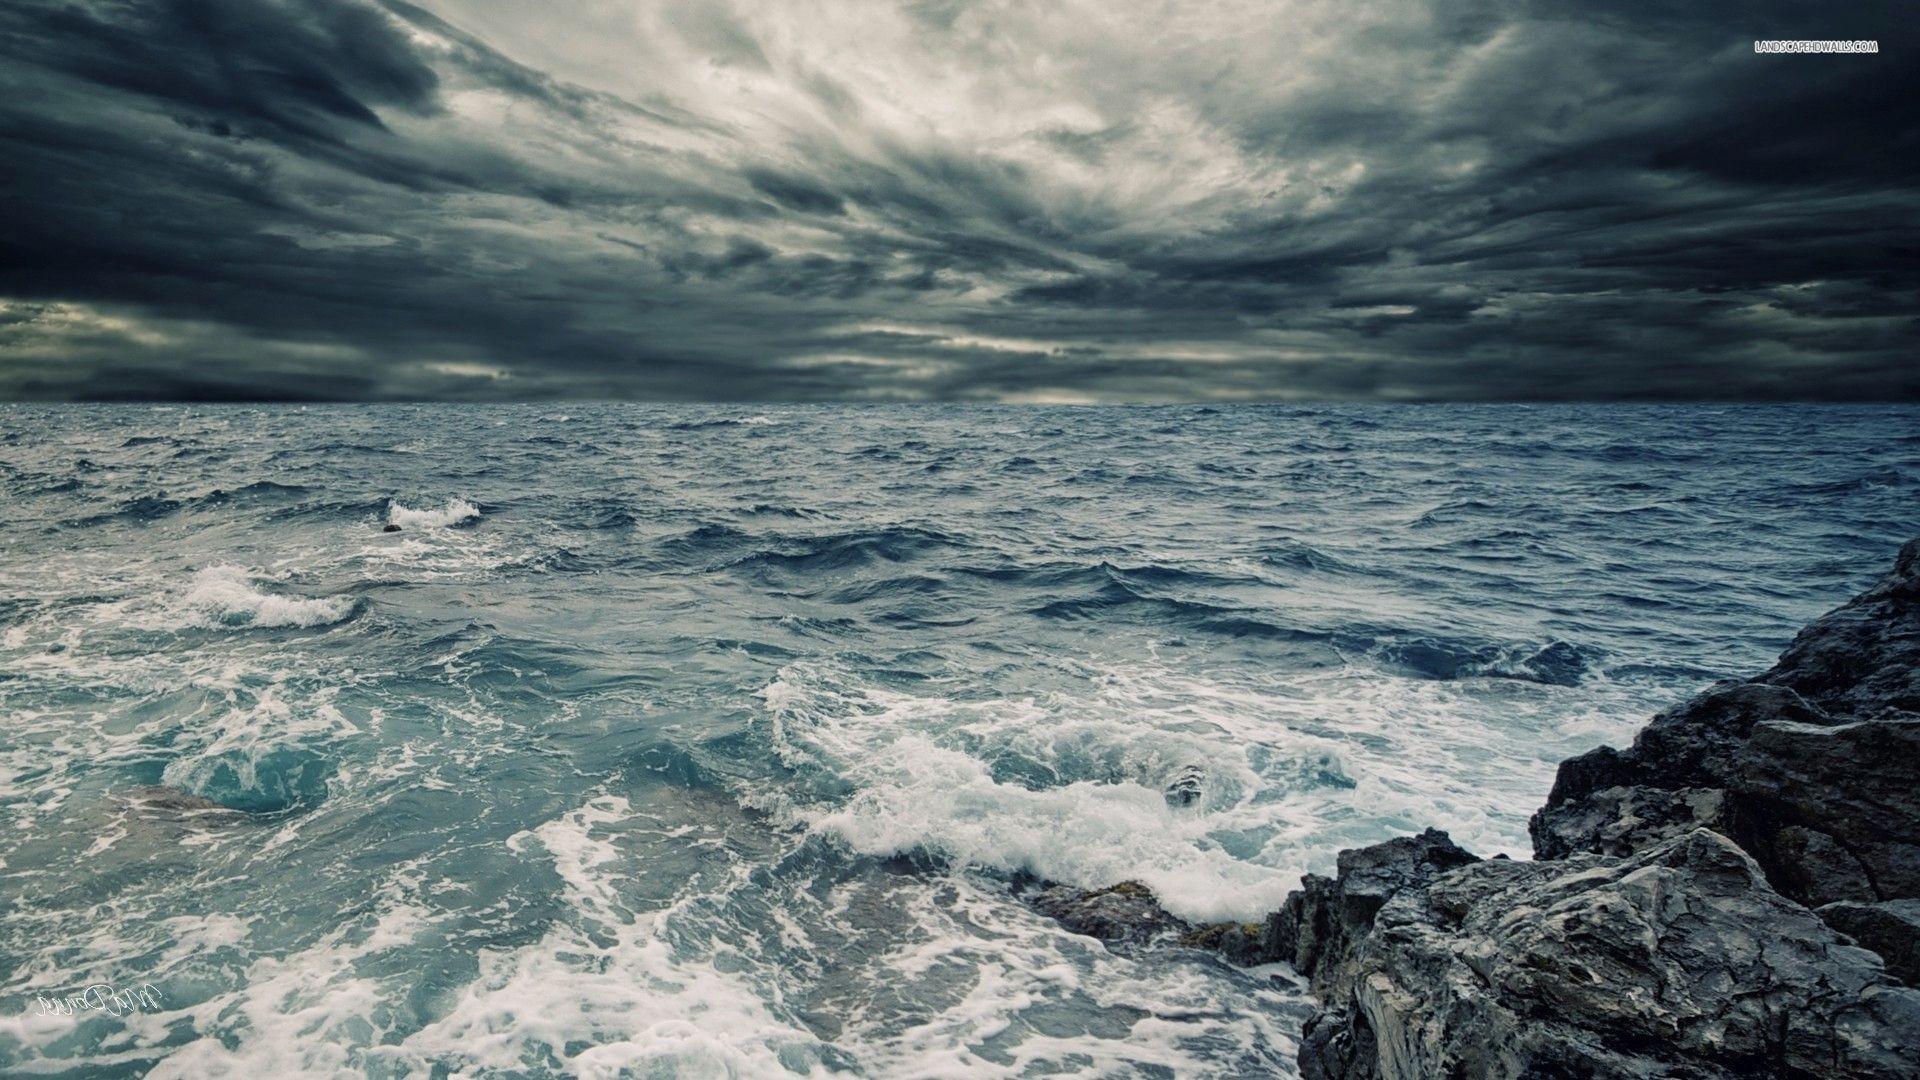 stormy-sea-sky-5060-1920×1080